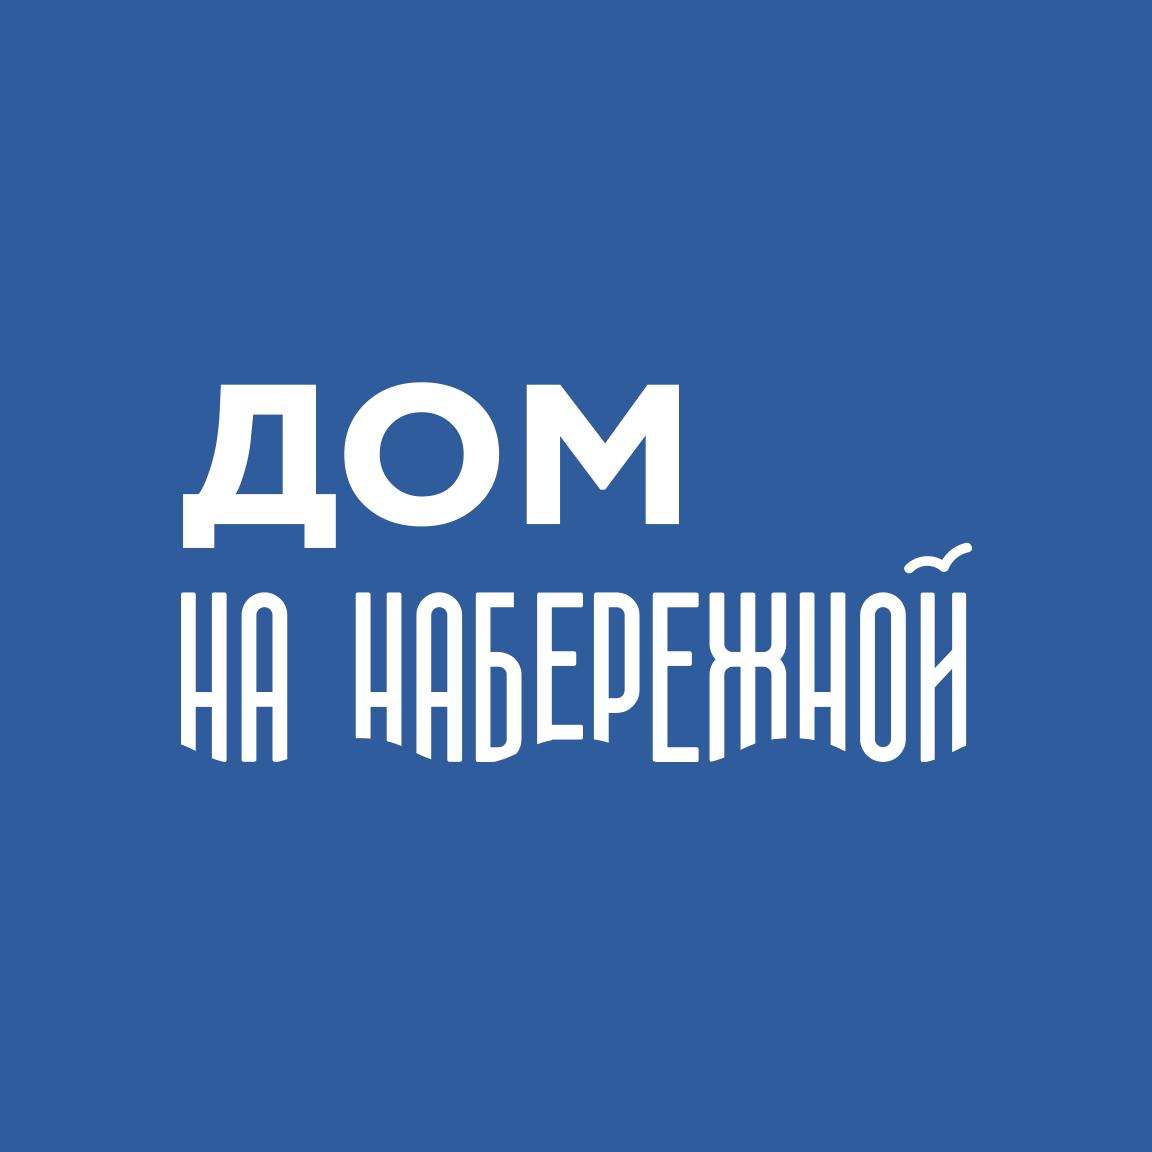 РАЗРАБОТКА логотипа для ЖИЛОГО КОМПЛЕКСА премиум В АНАПЕ.  фото f_5795de7f1e097a75.jpg